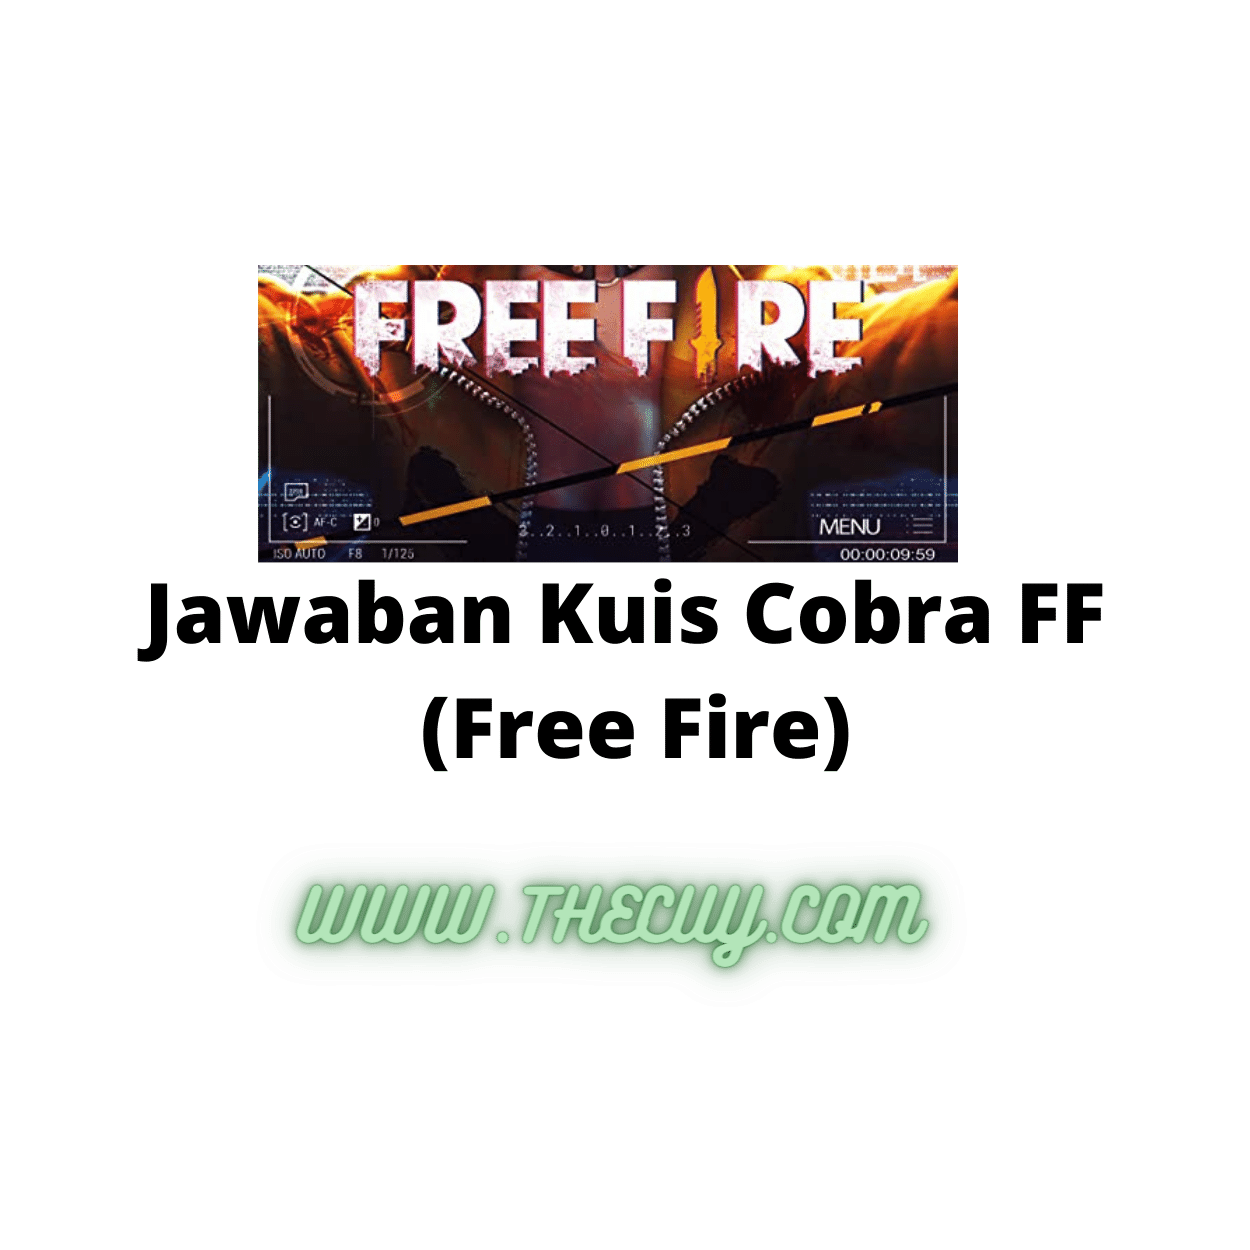 Jawaban Kuis Cobra FF